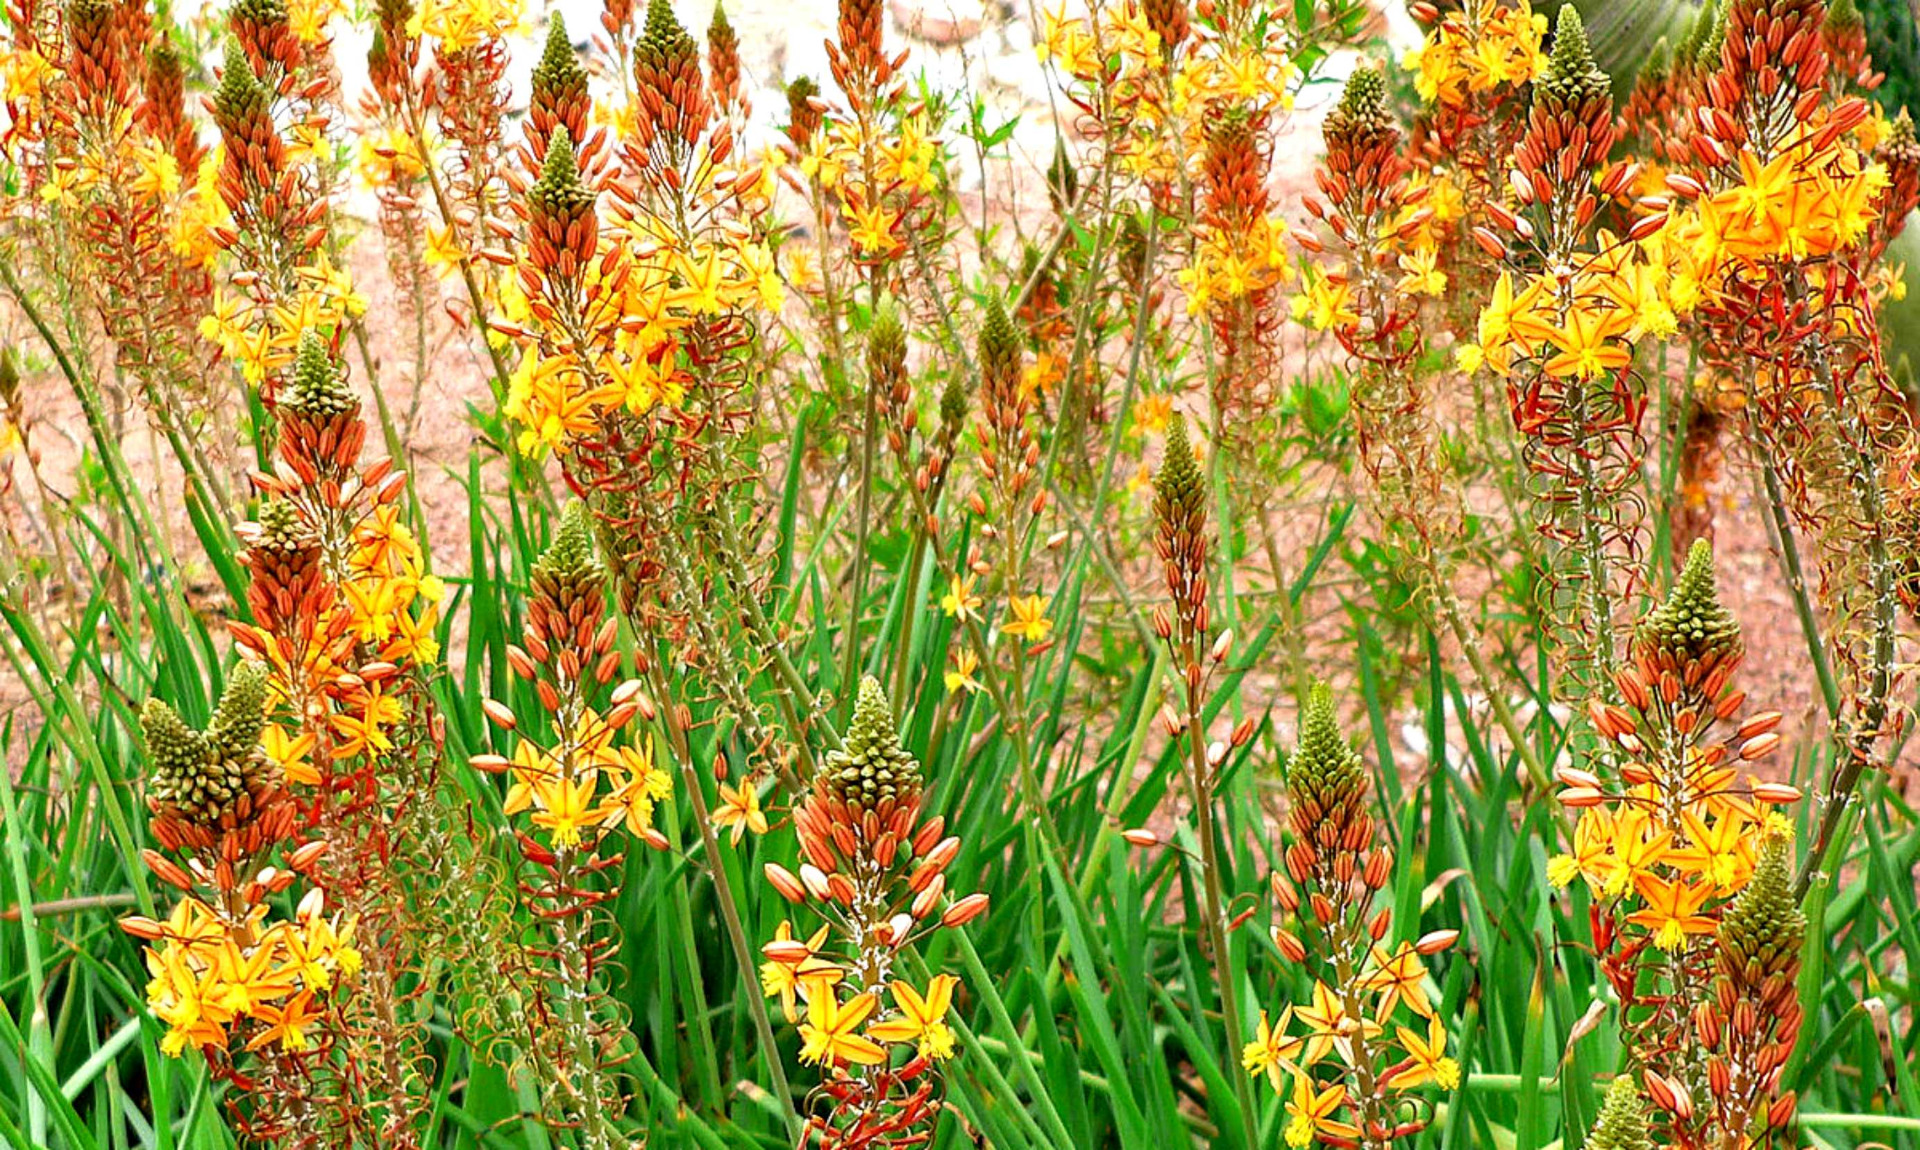 plante de rocaille - leaderplant